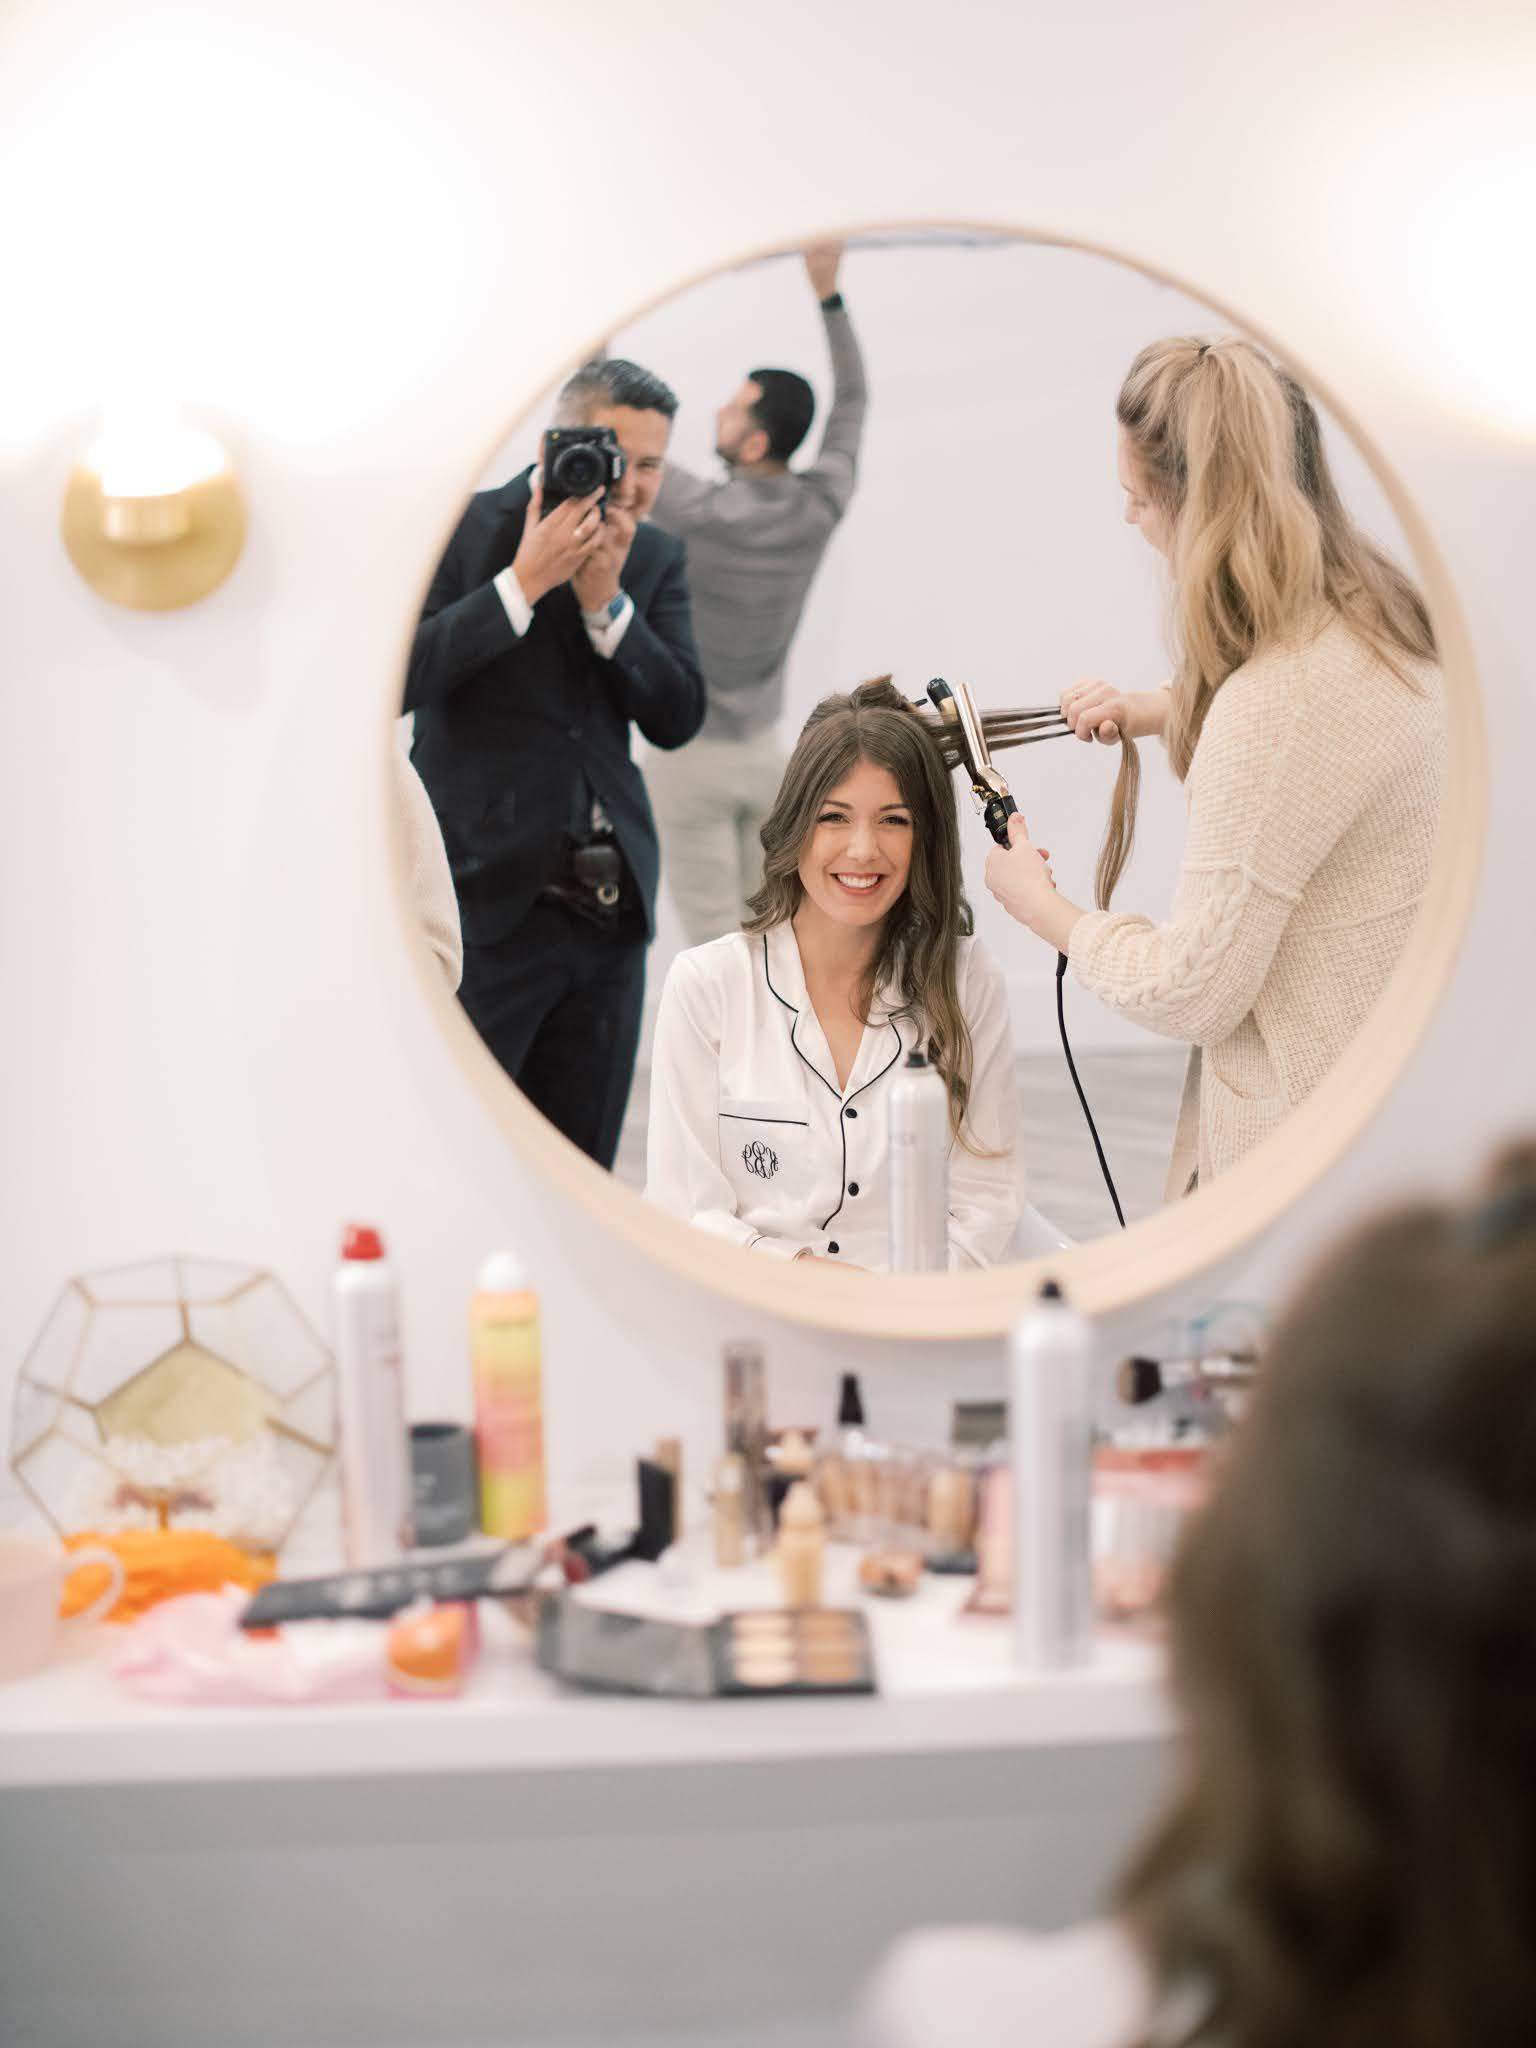 Wedding Hair and Makeup Charleston - Chasing Cinderella